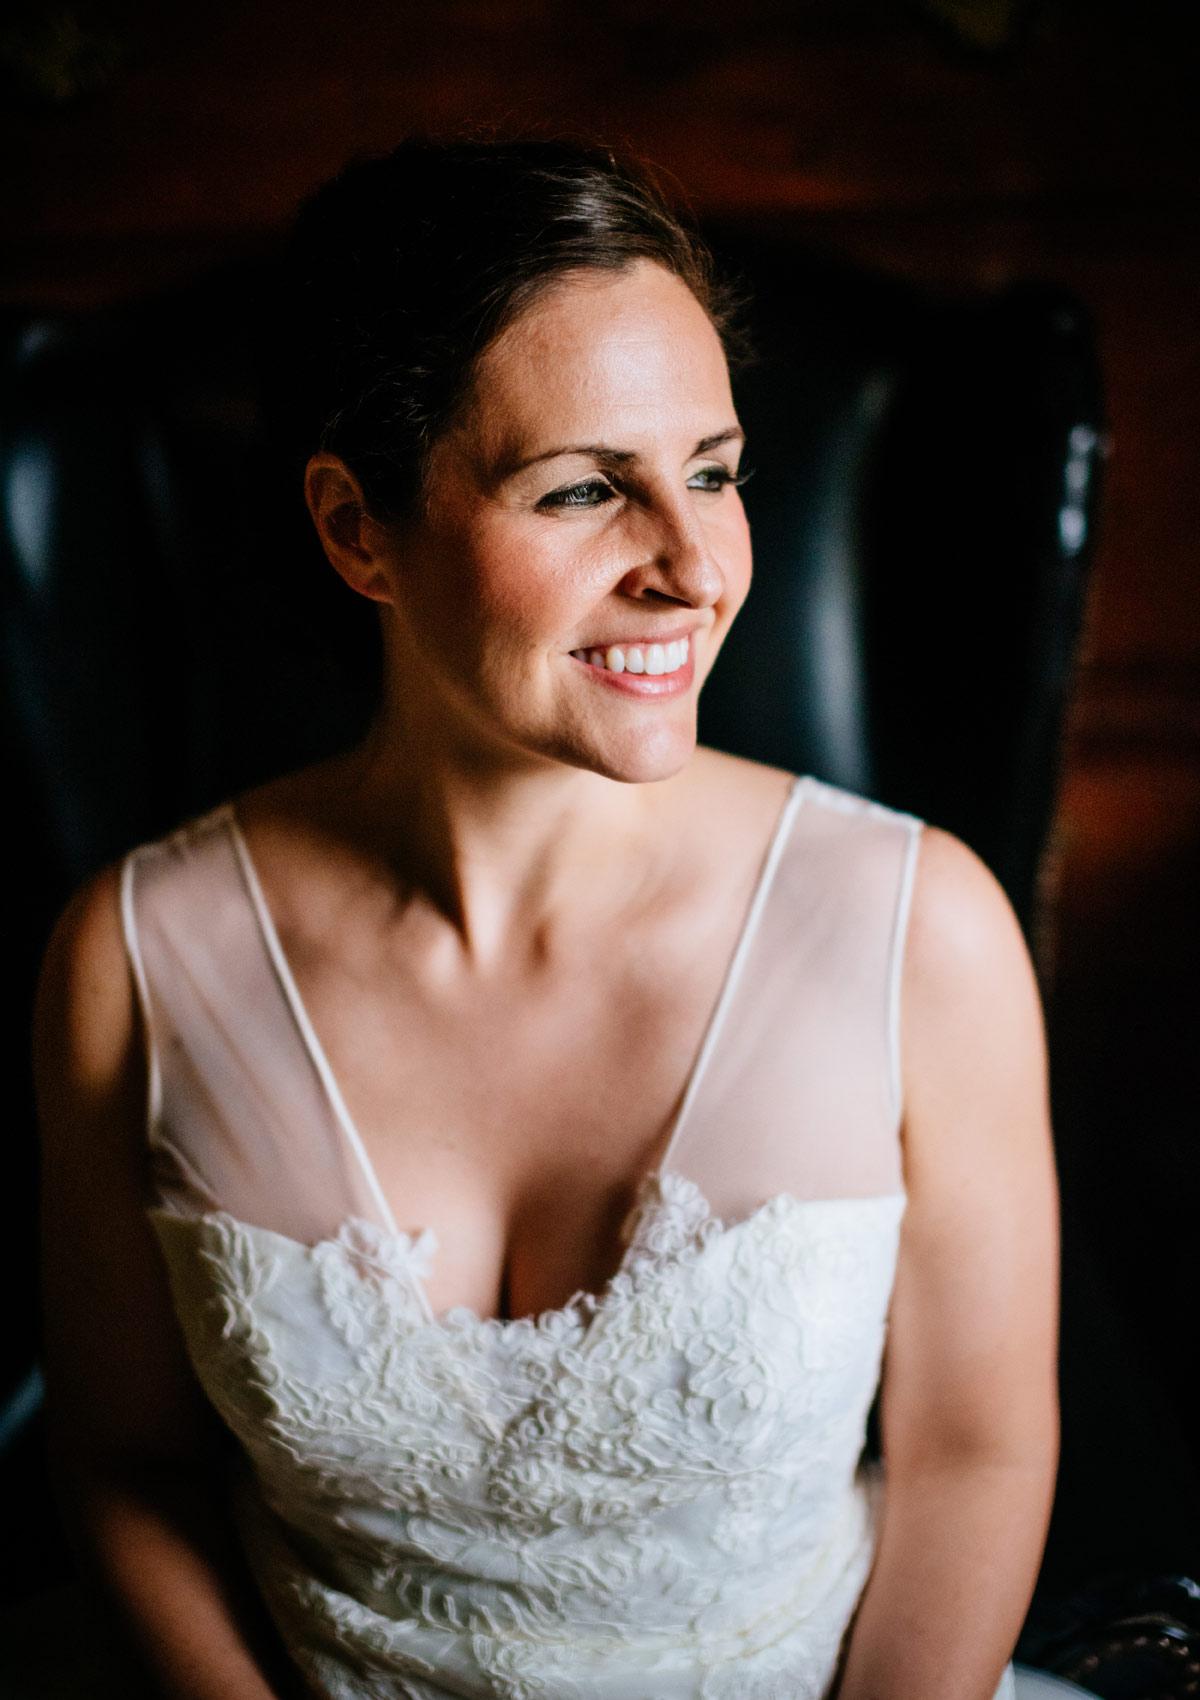 009c pharsalia virginia wedding bridal portrait